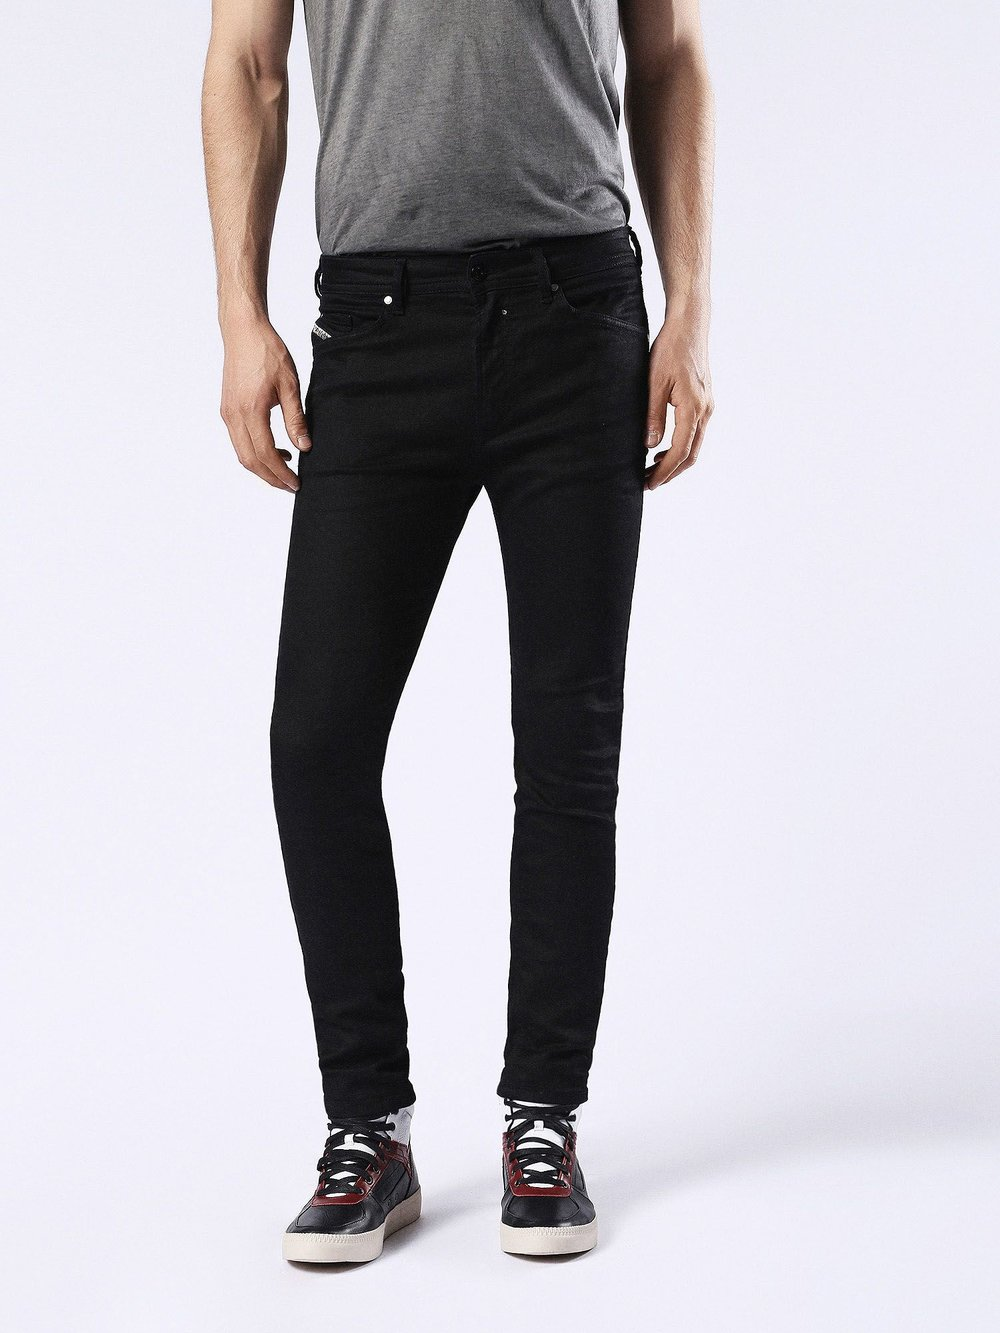 diesel_jogg_jeans_spender_0608v